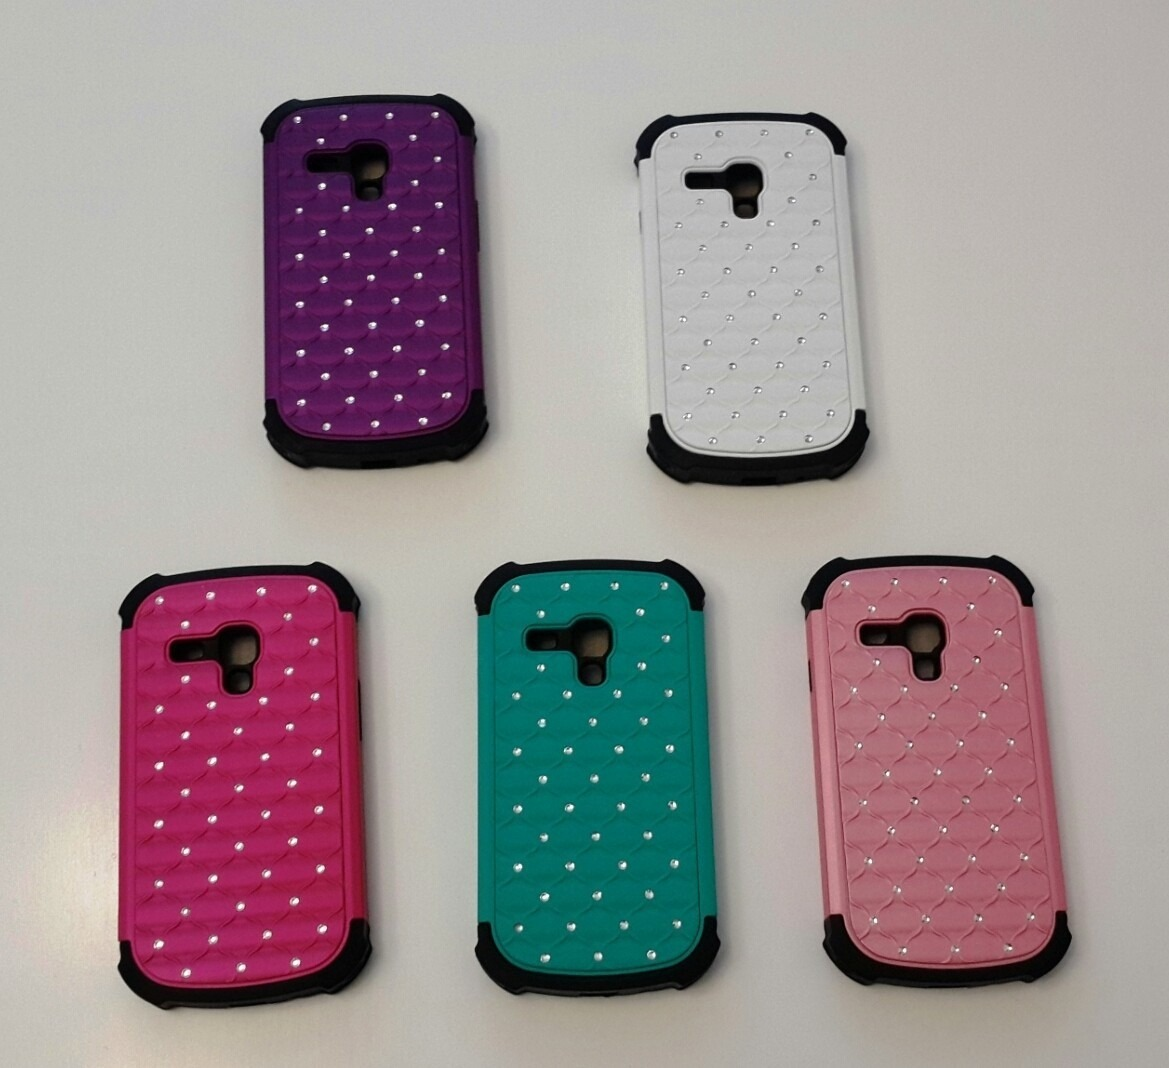 Forros samsung galaxy s3 y s3 mini celular estuche funda bs en mercado libre - Fundas para s3 mini ...